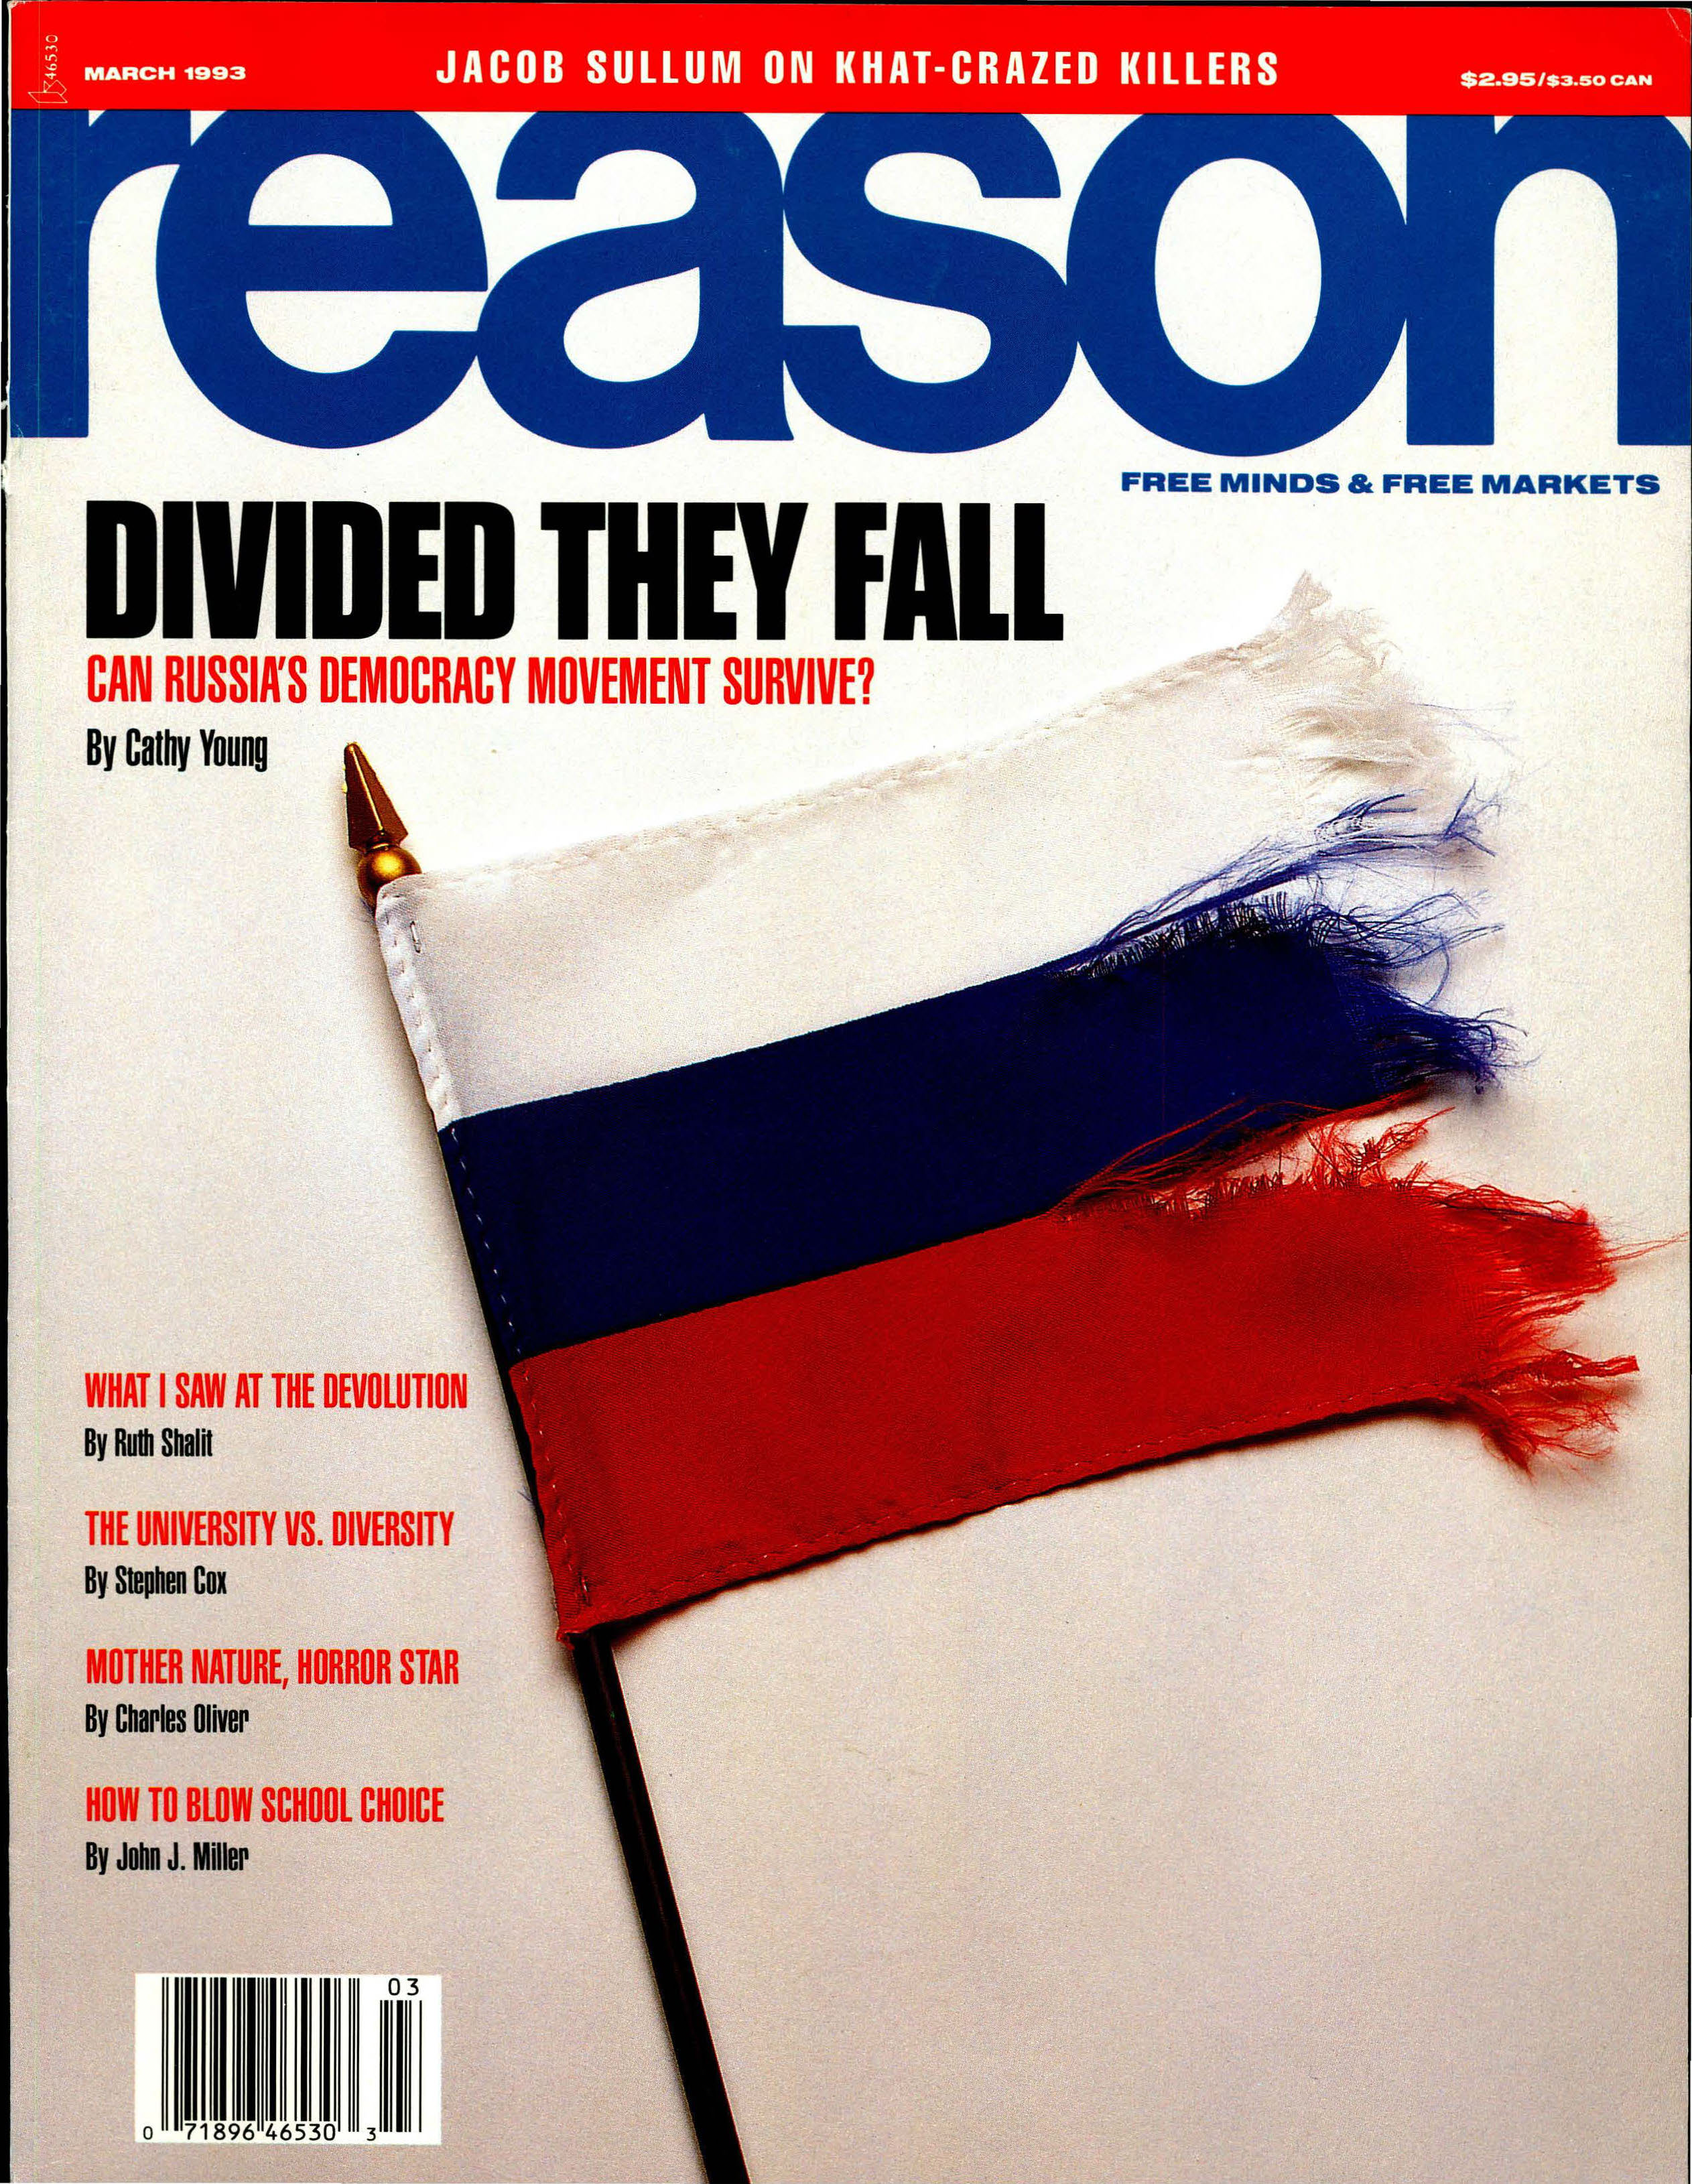 Reason Magazine, March 1993 cover image